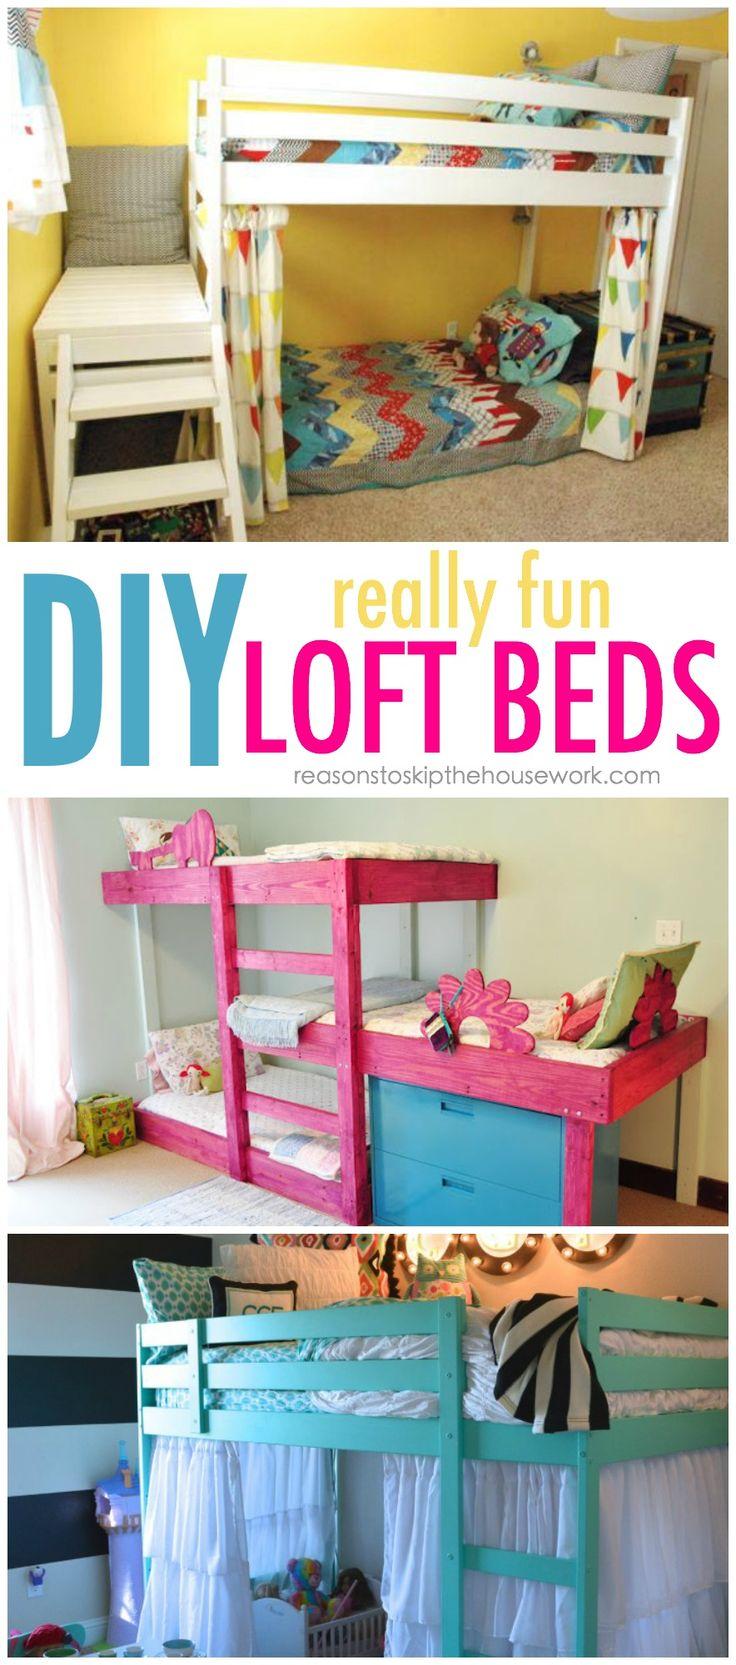 best 25 loft bed curtains ideas on pinterest loft bed. Black Bedroom Furniture Sets. Home Design Ideas